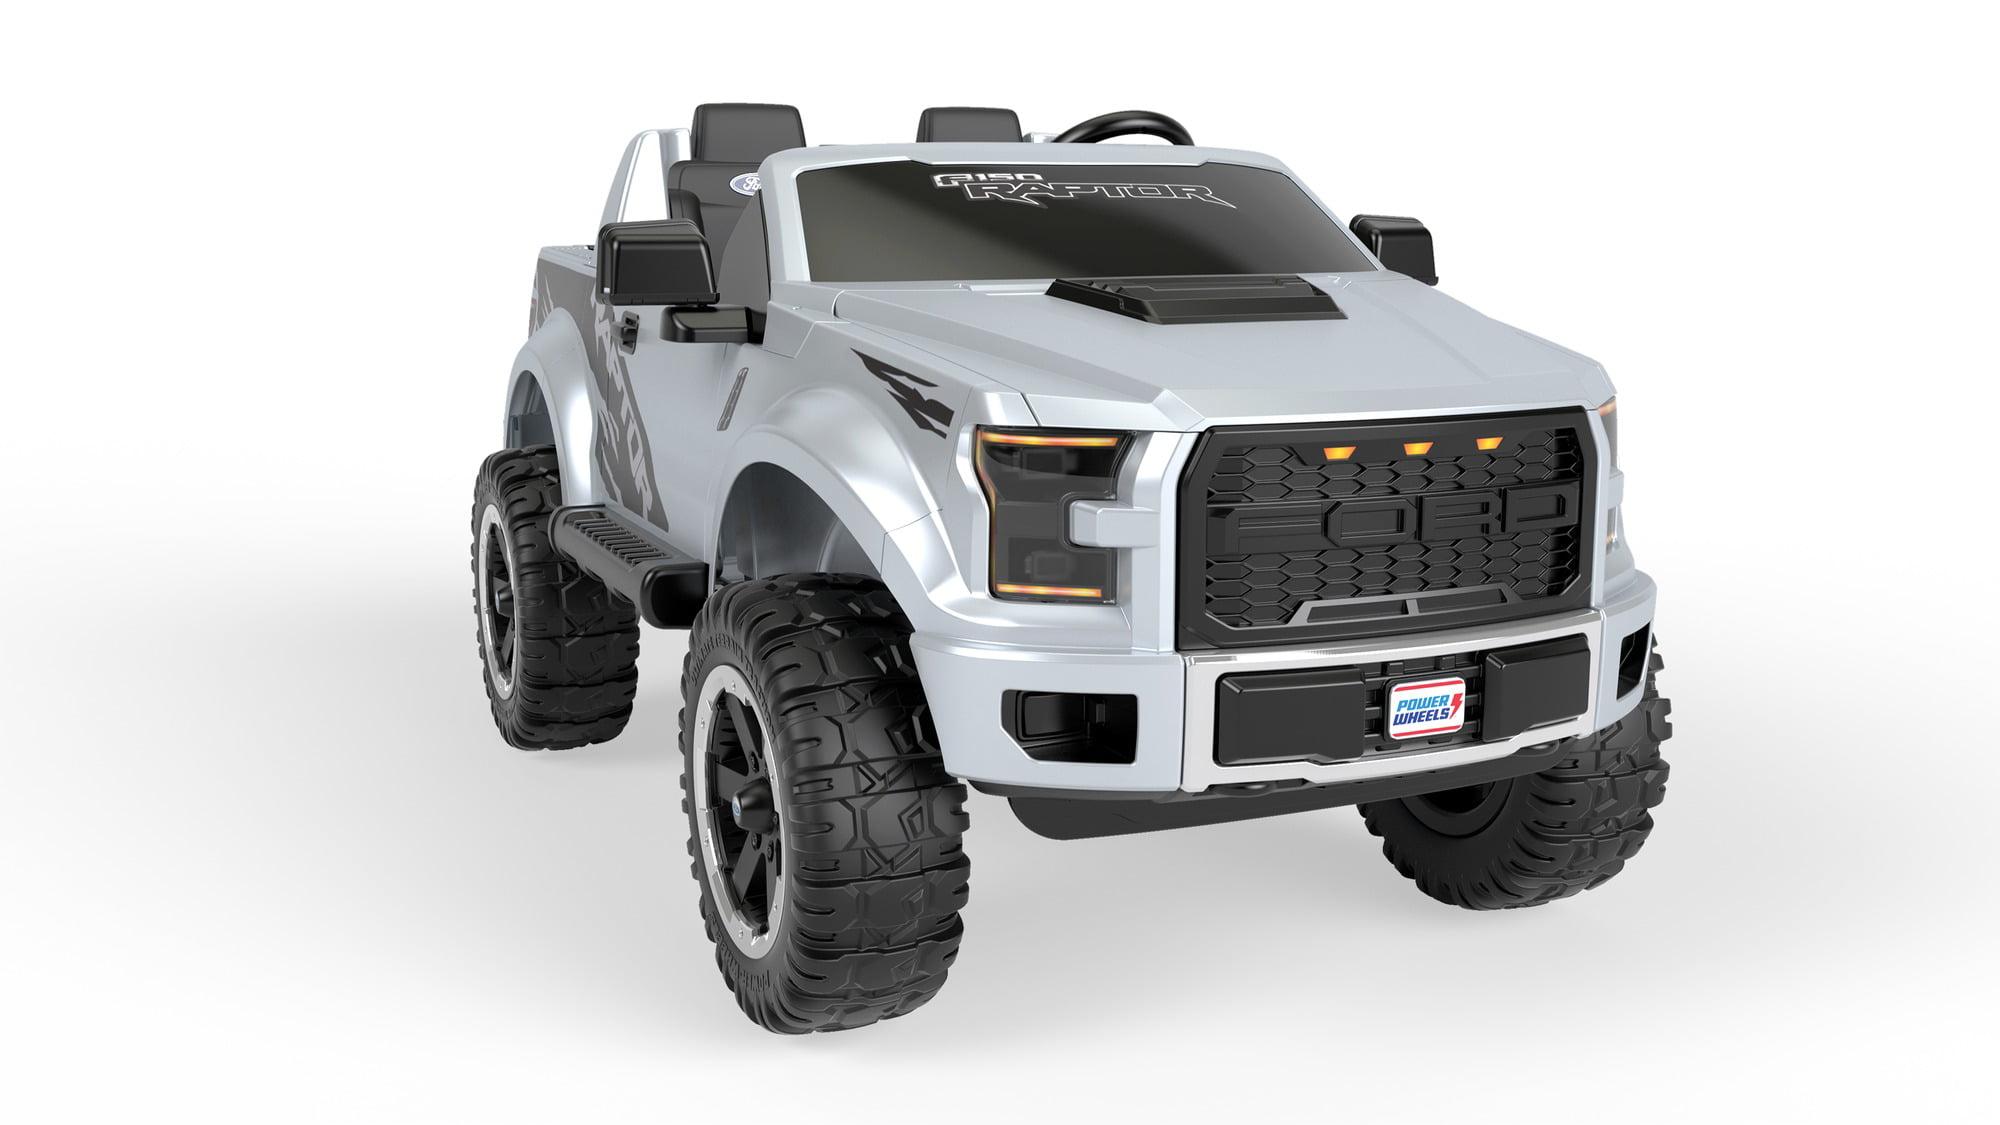 12v electric power wheels ford f 150 raptor extreme ride on toy truck kids gift ebay. Black Bedroom Furniture Sets. Home Design Ideas